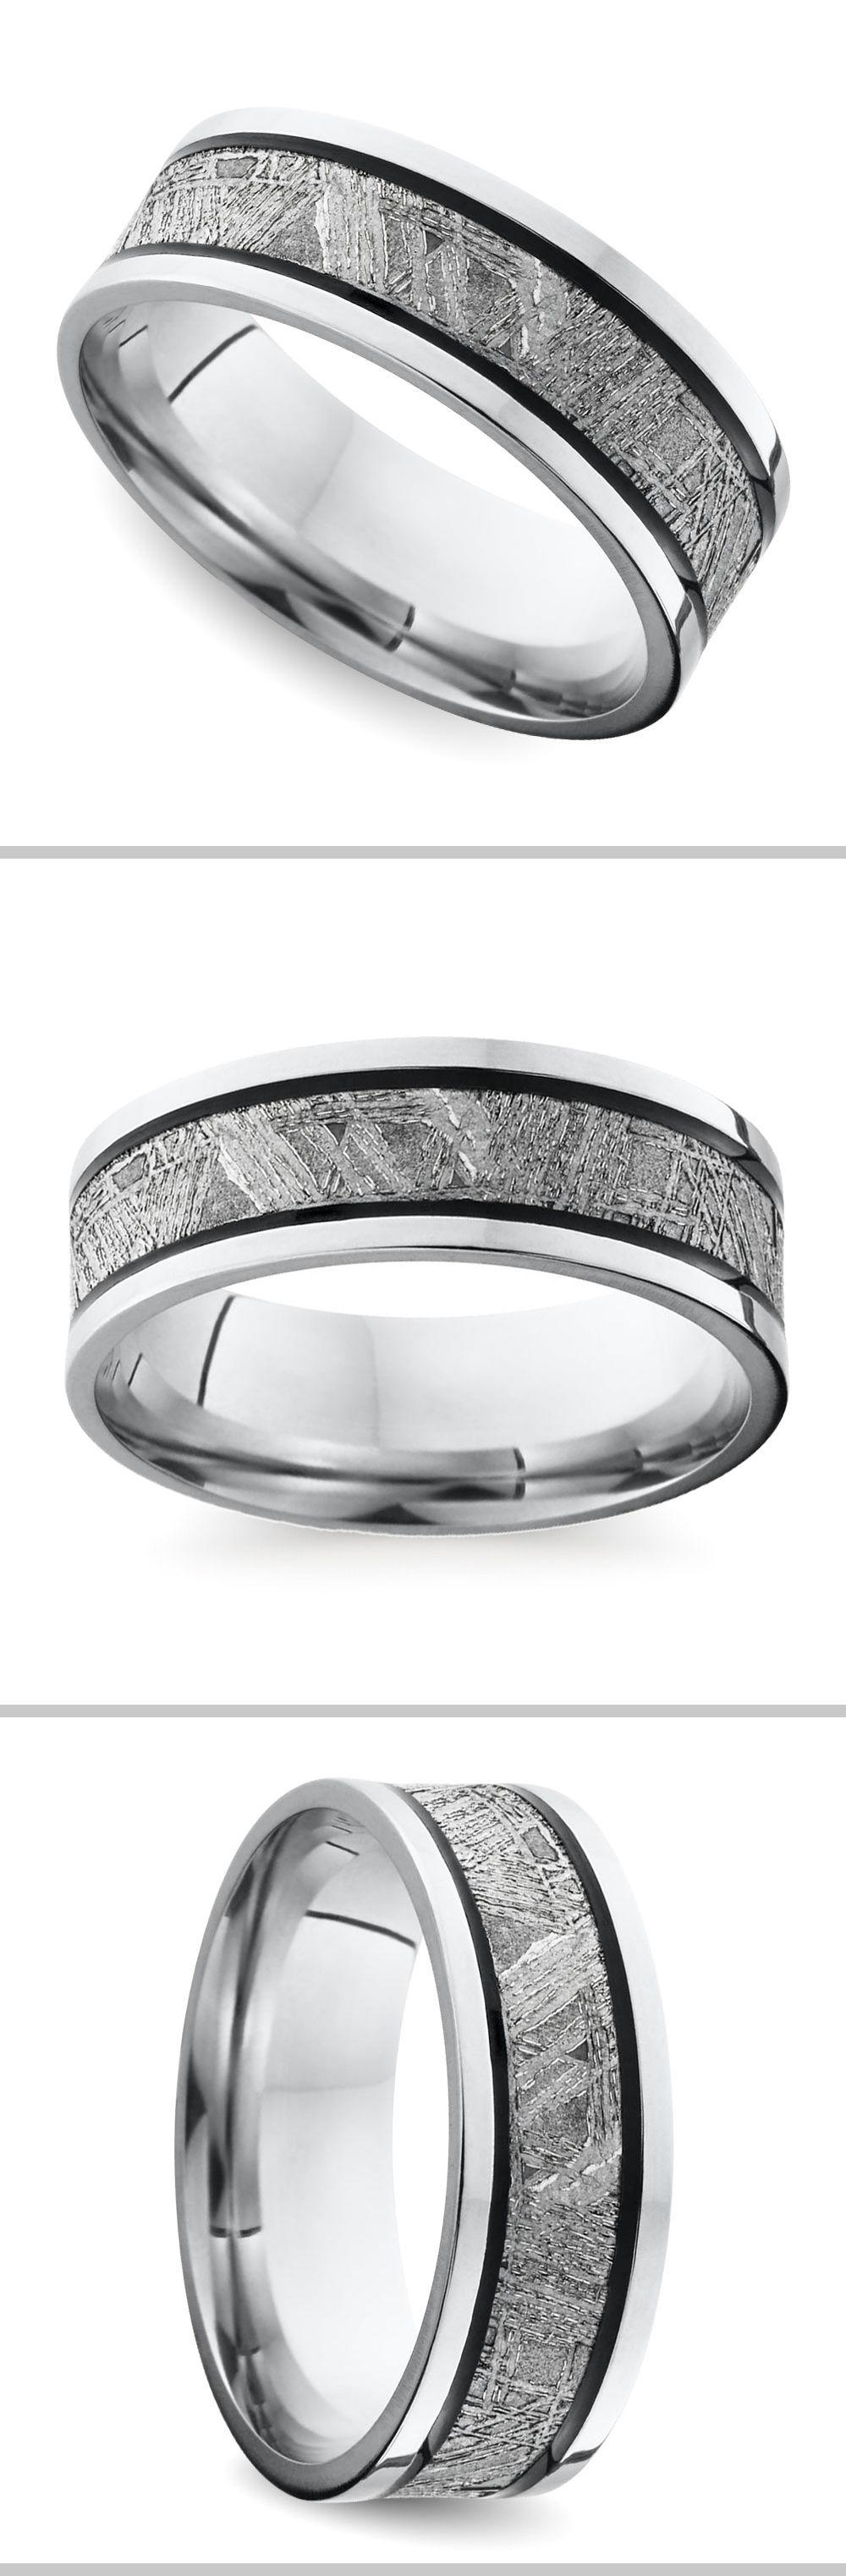 Orion Antique Cobalt Mens Wedding Ring With Meteorite